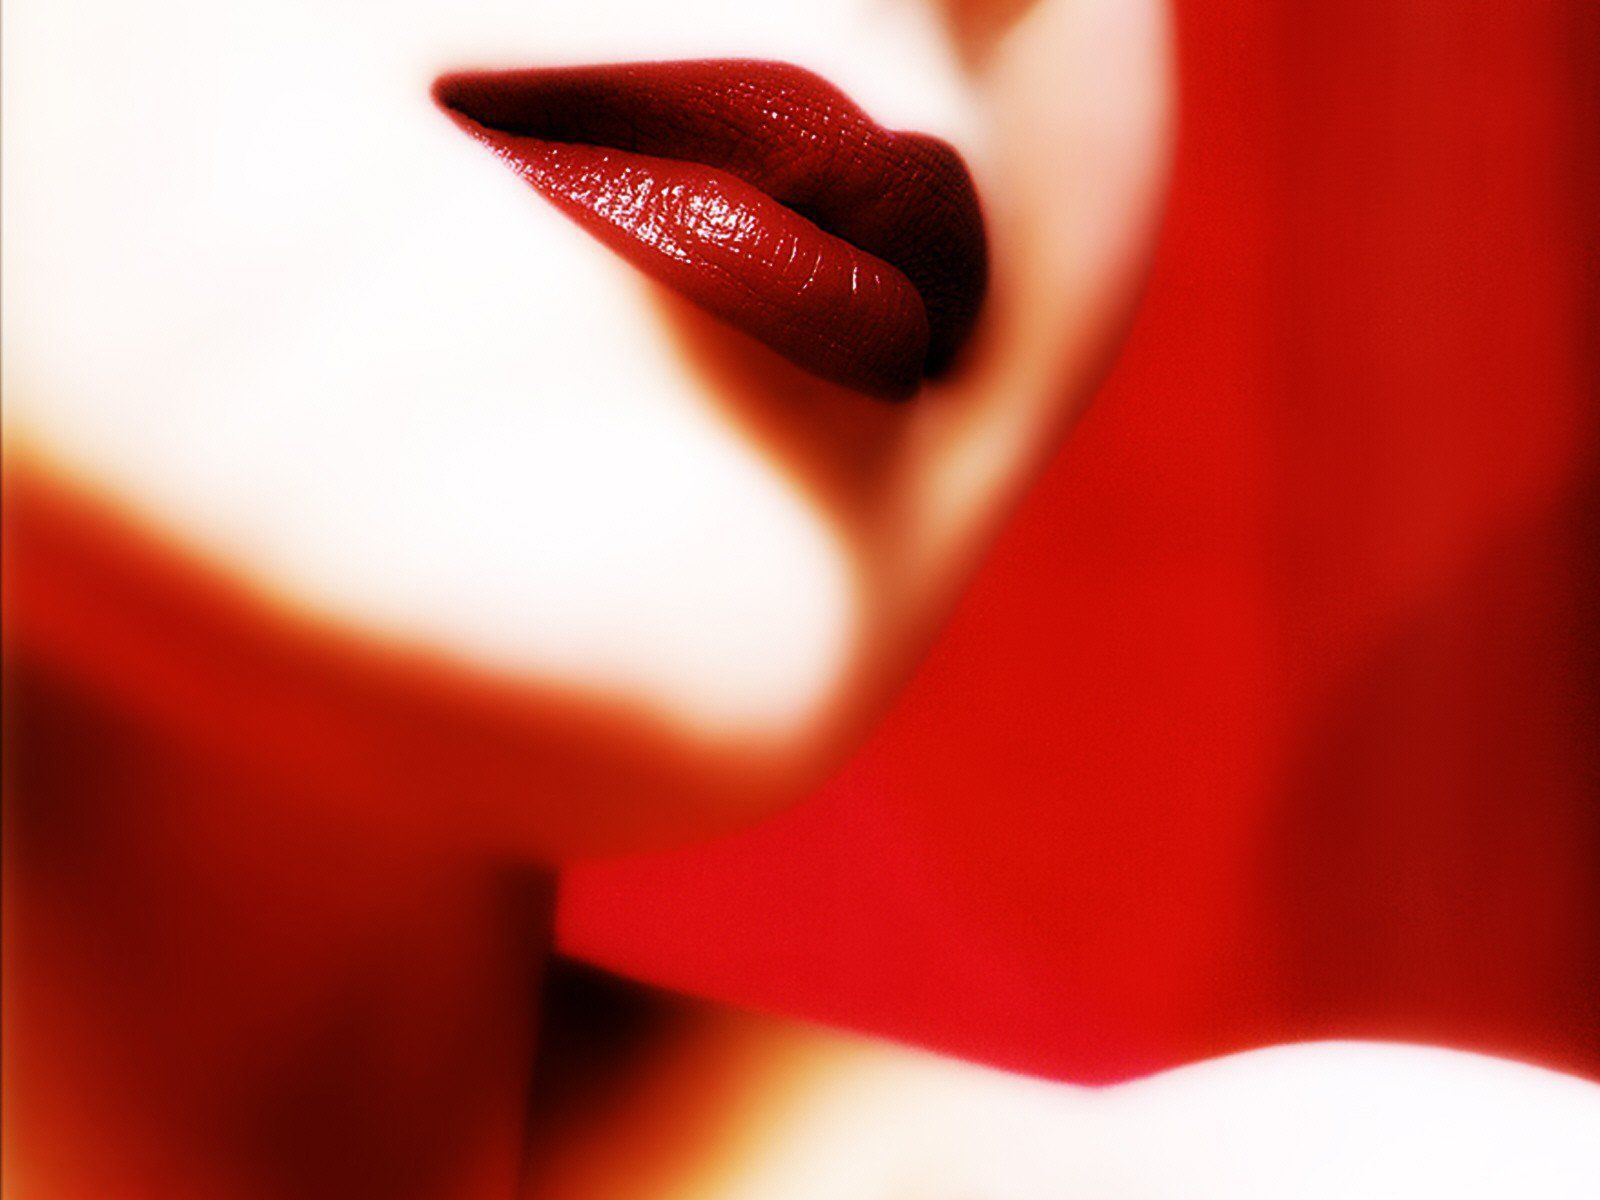 Bouche sensuelle